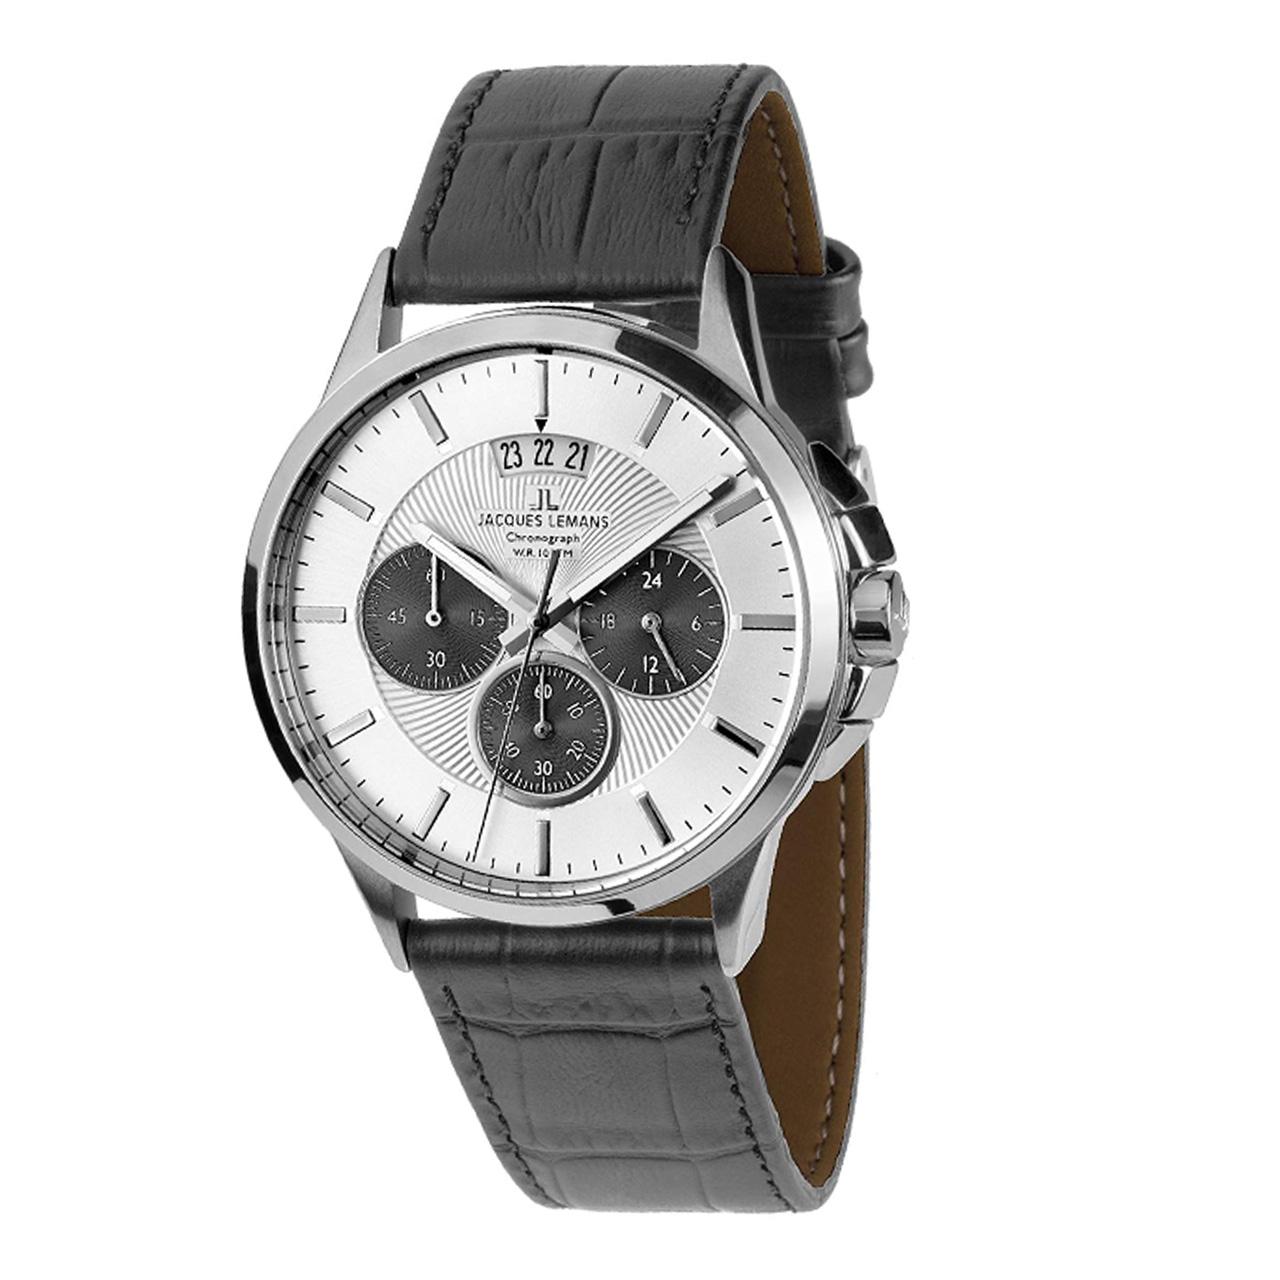 ساعت مچی عقربه ای مردانه ژاک لمن مدل 1-1542L